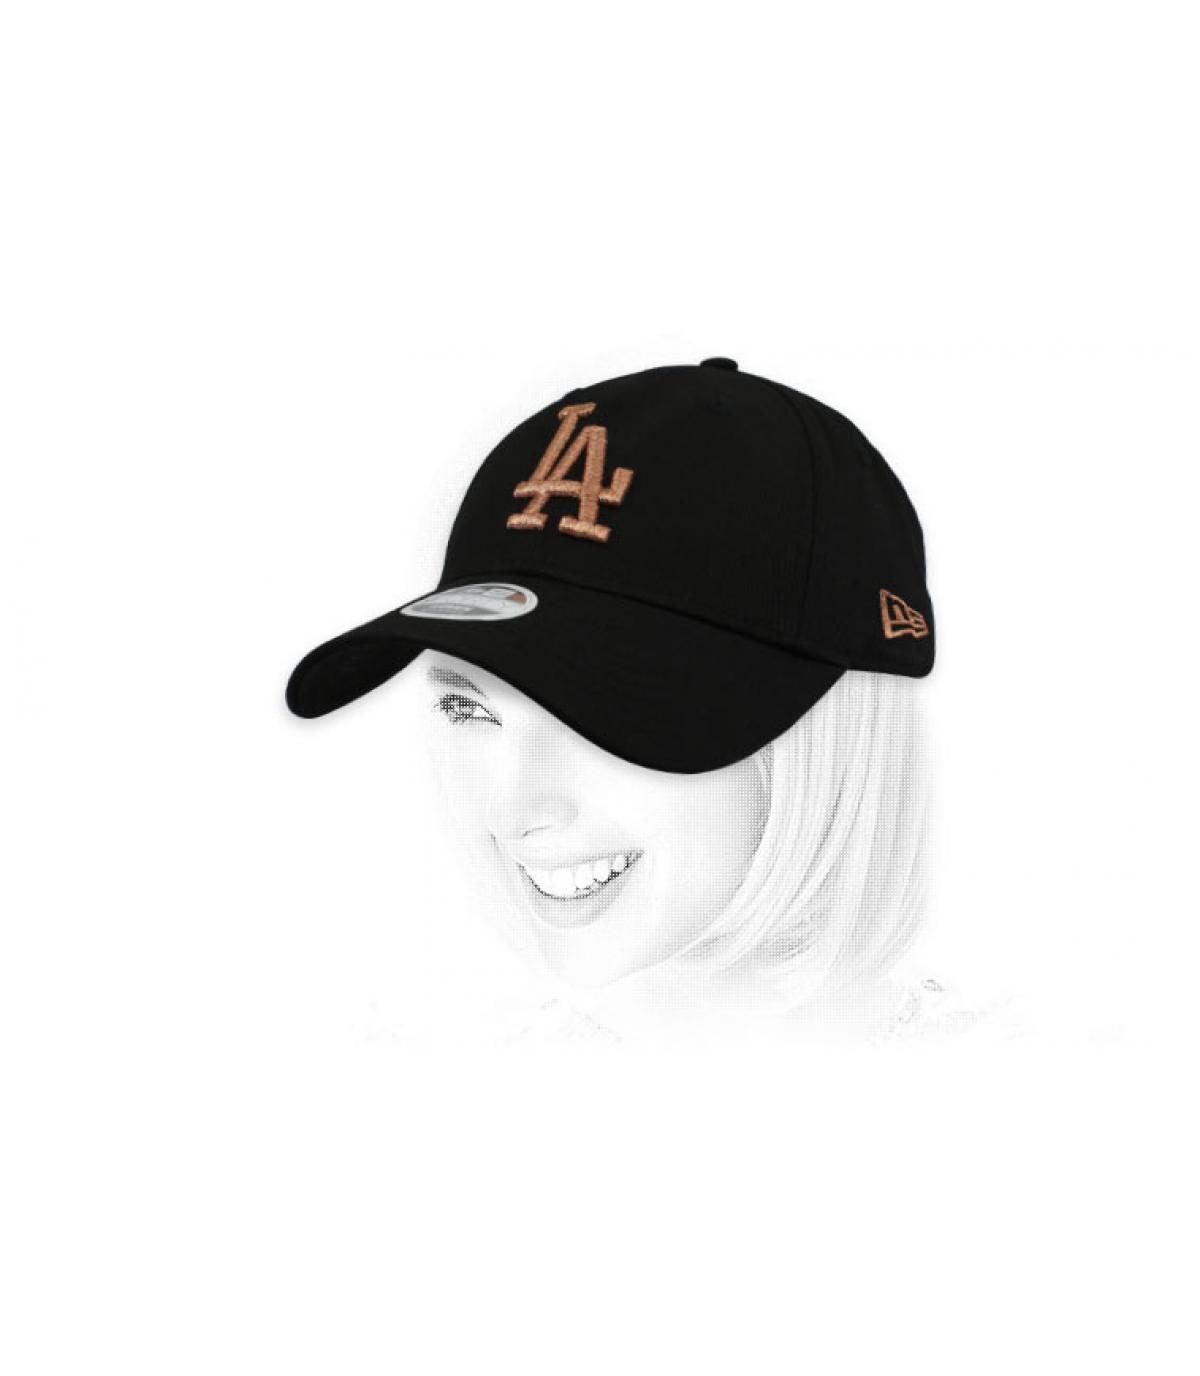 gorra LA mujer negro oro rosa